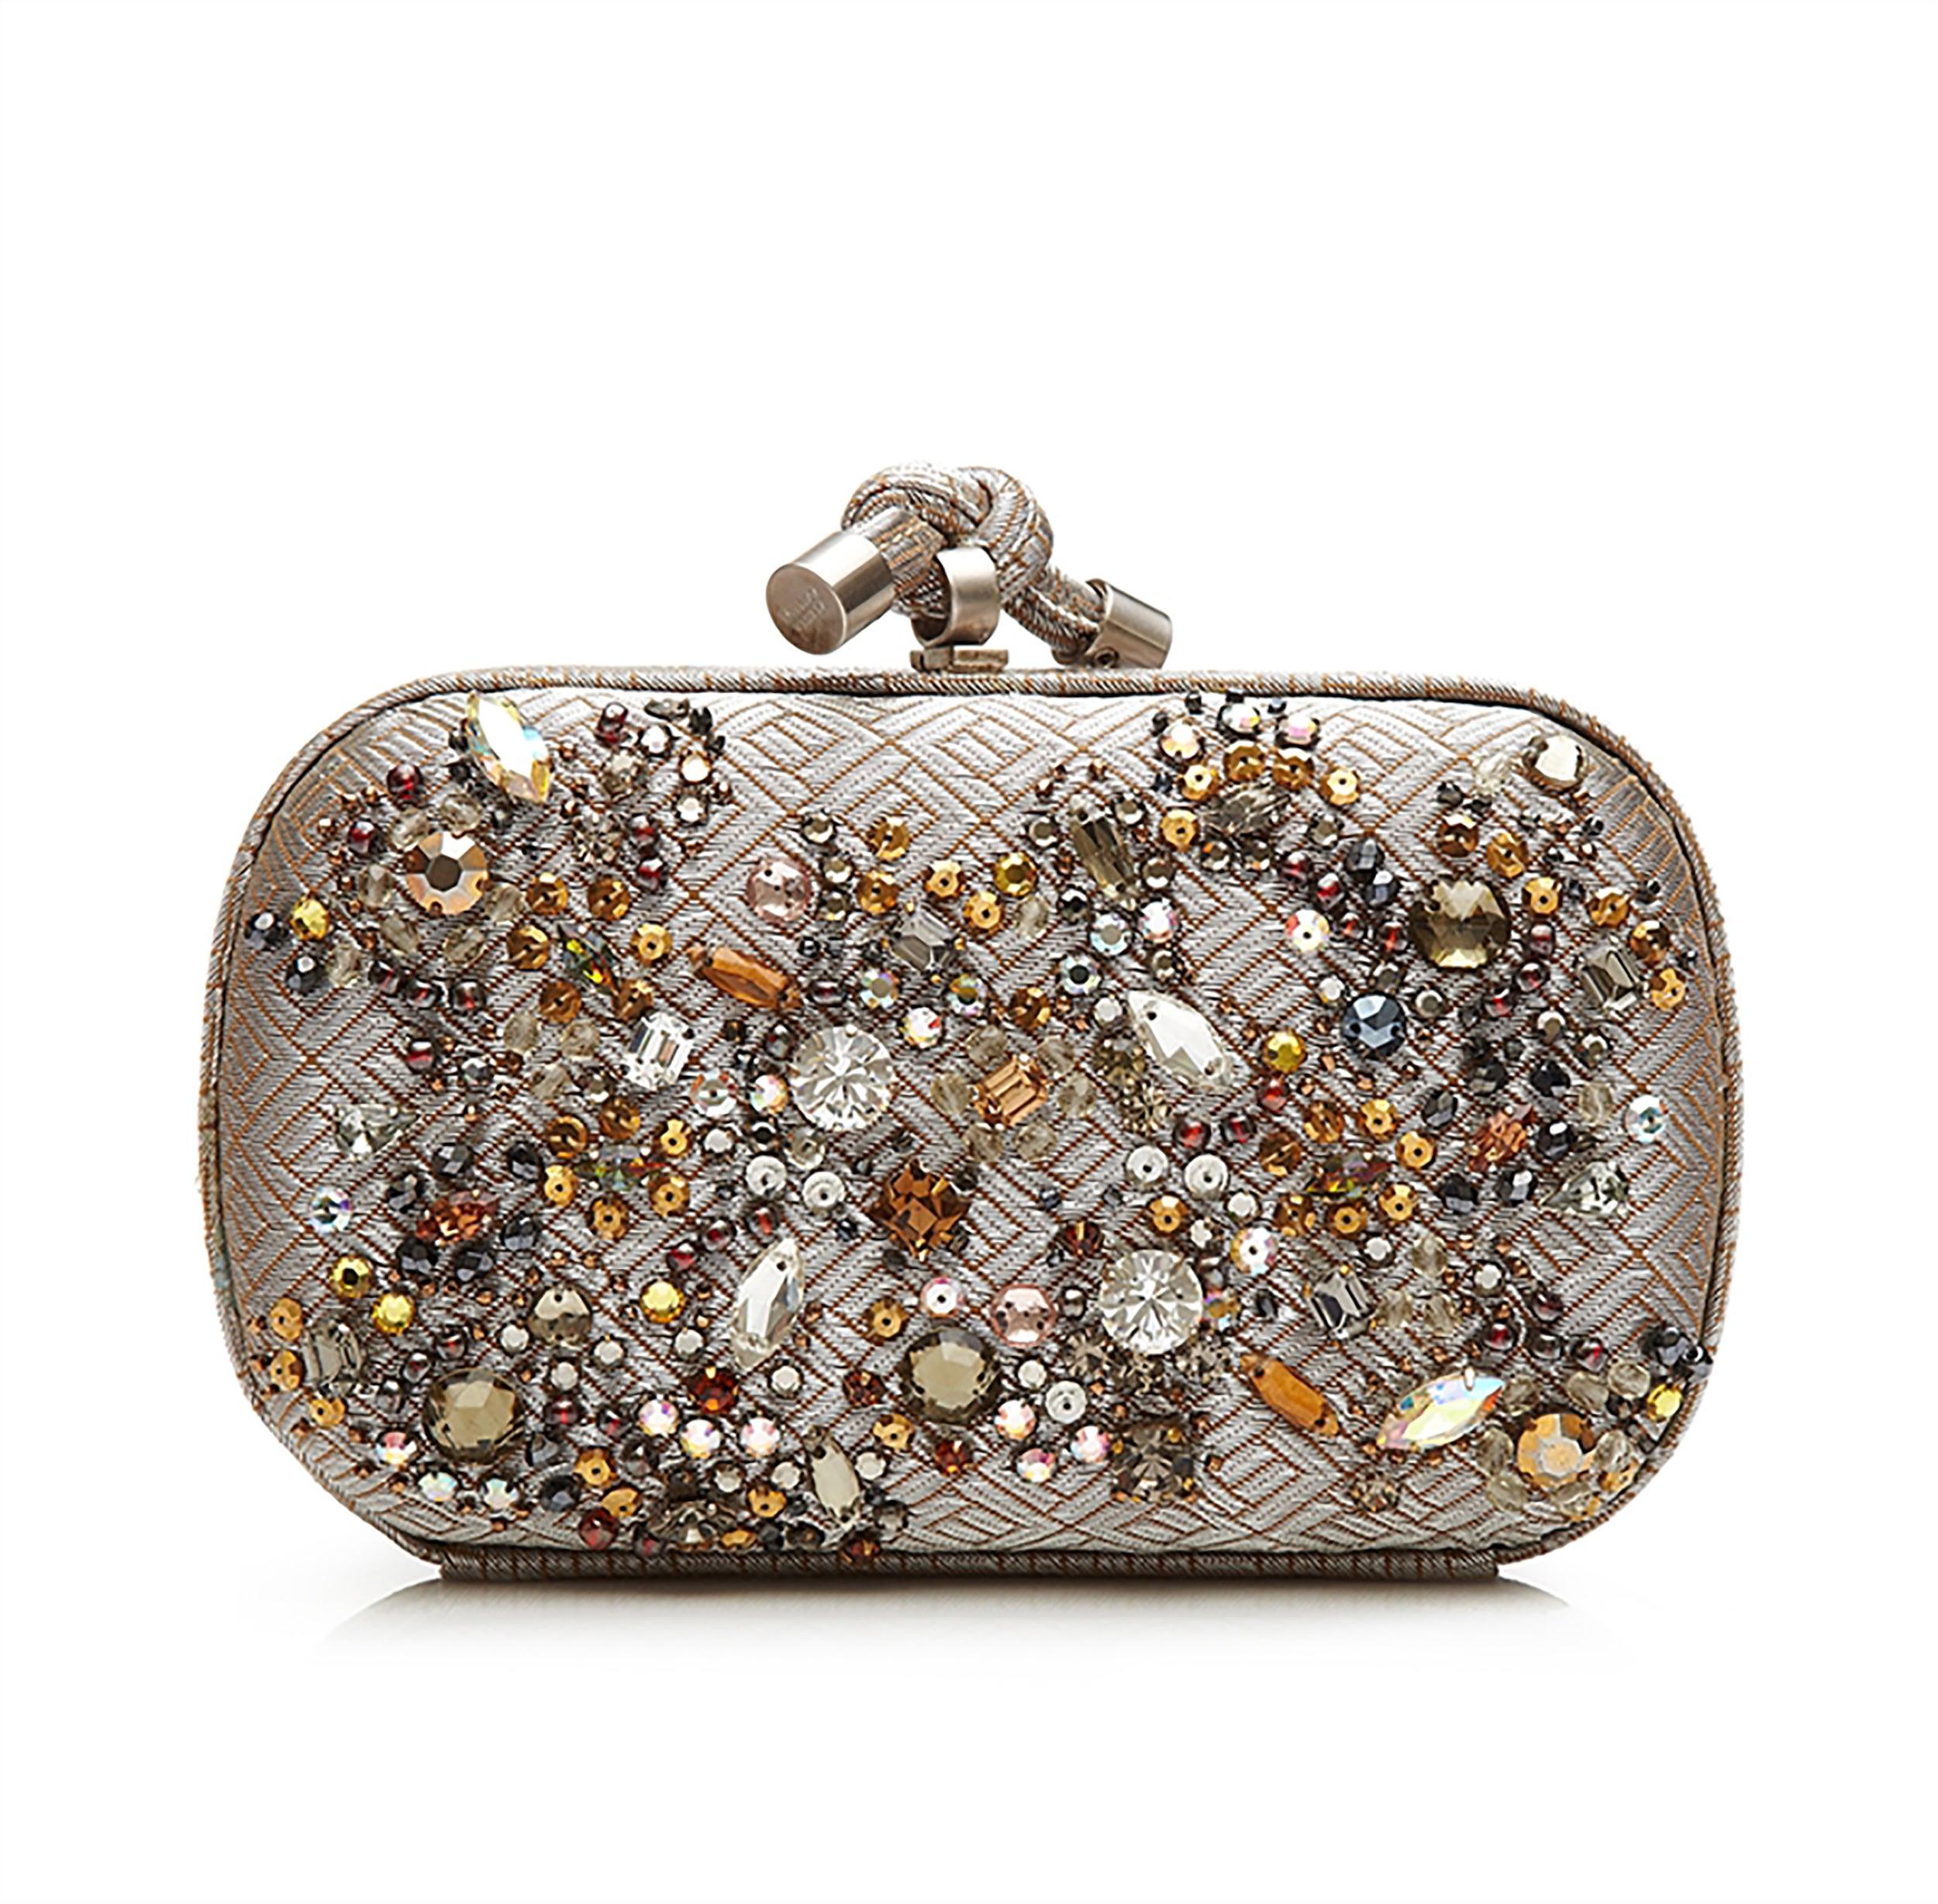 ad76604f5e Bottega Veneta Crystal Embellished Knot Clutch Bag at 1stdibs